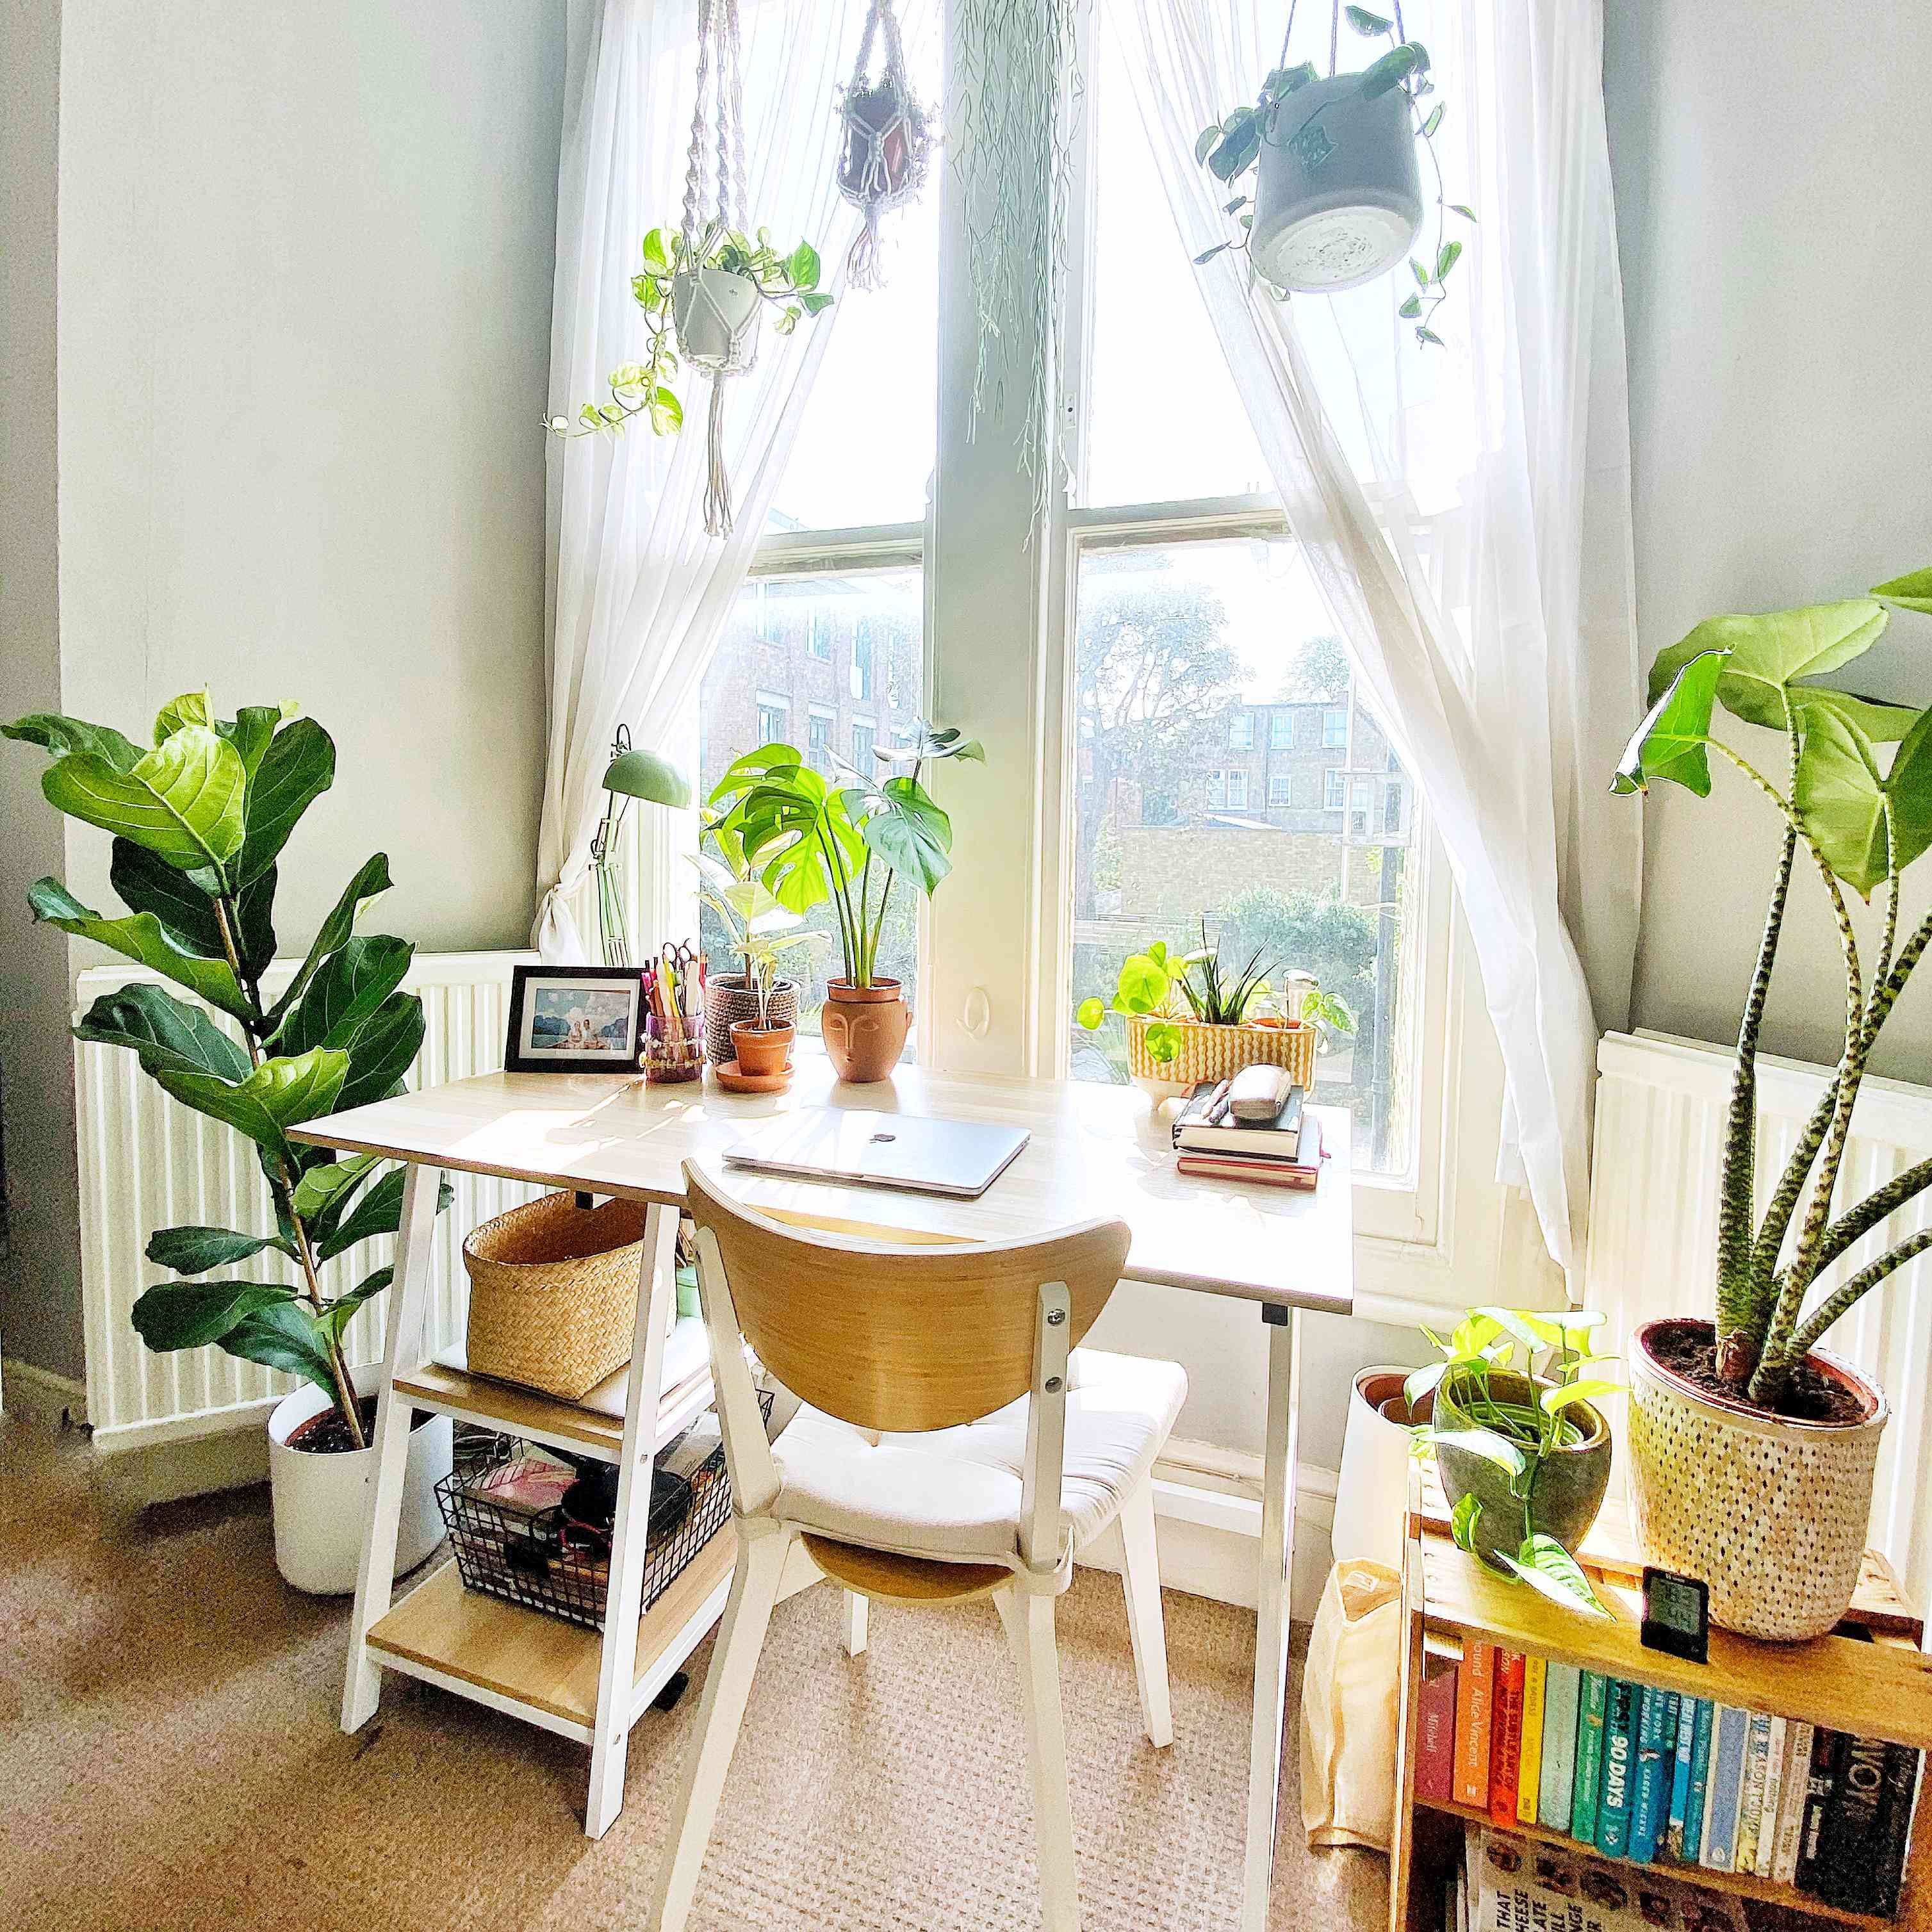 Desk area with Fiddle Leaf Fig